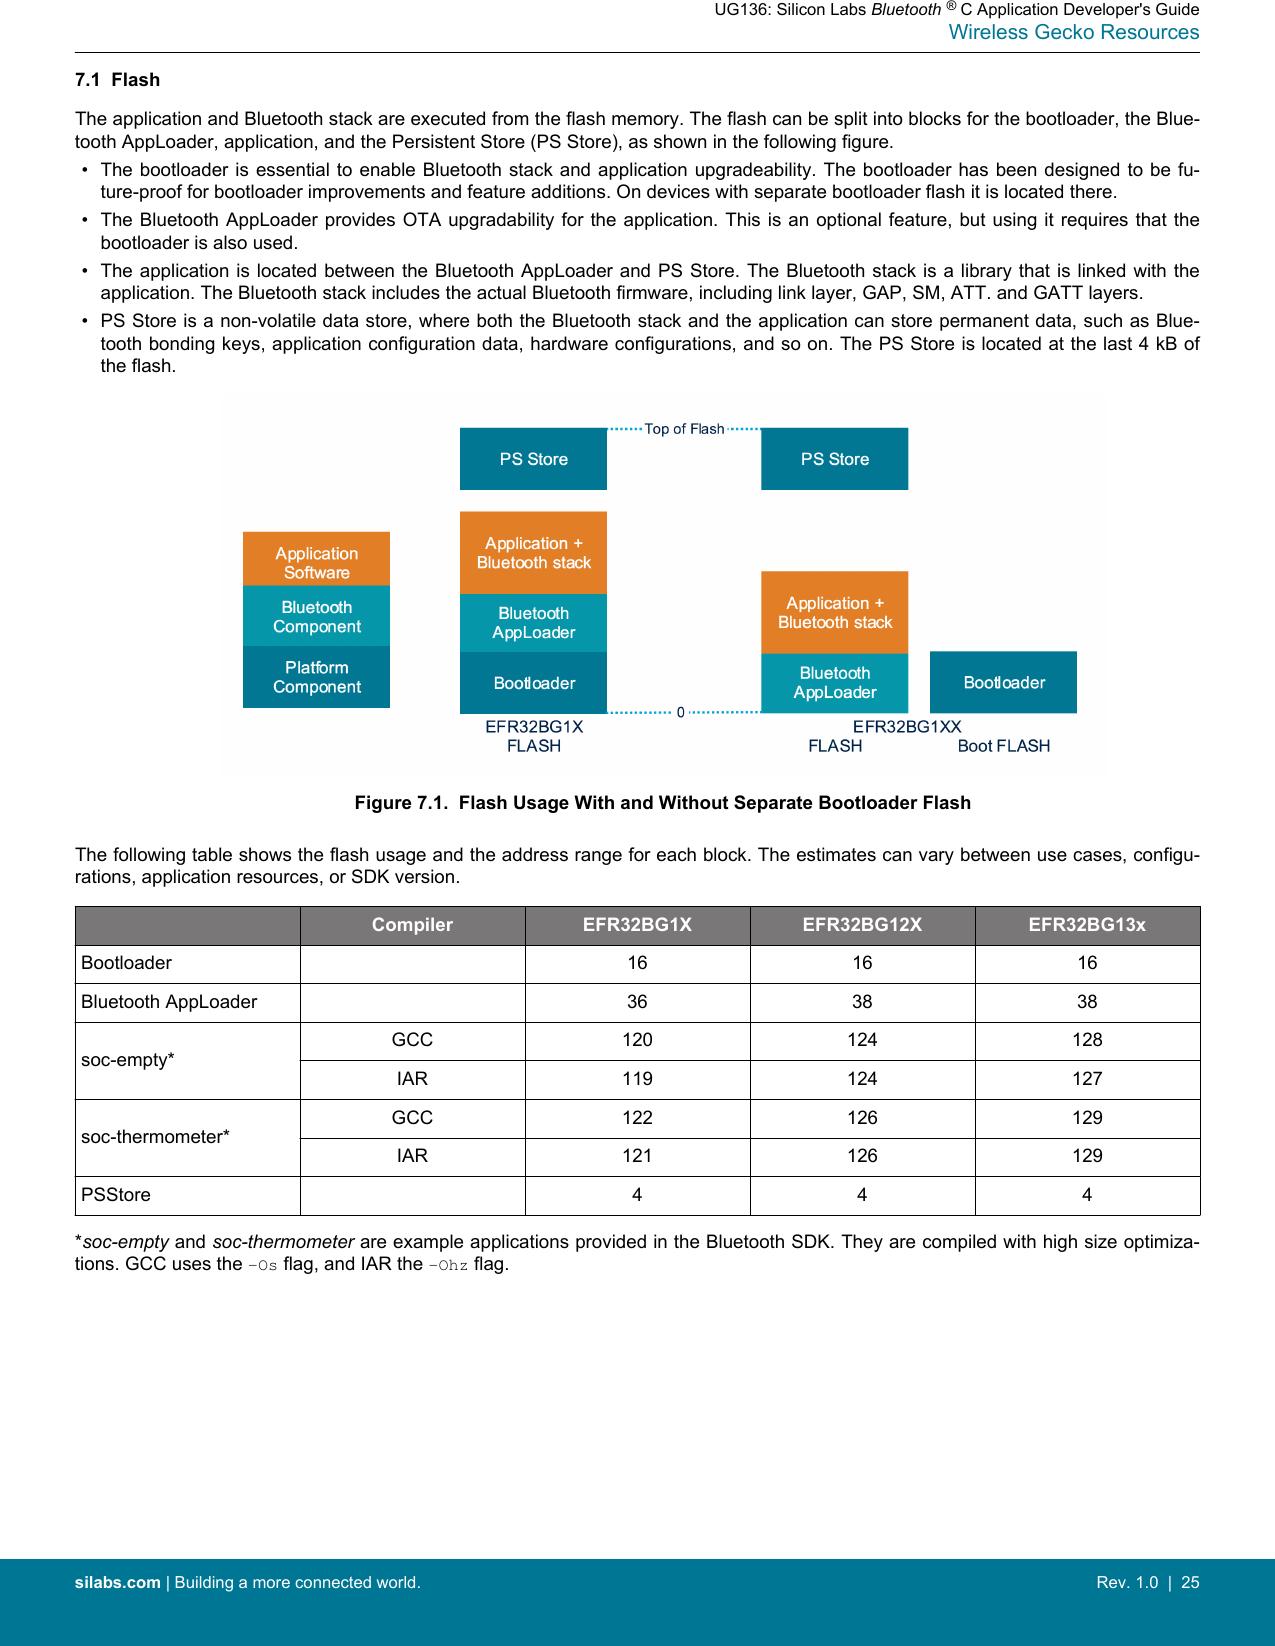 UG136: Silicon Labs Bluetooth ® C Application Developer's